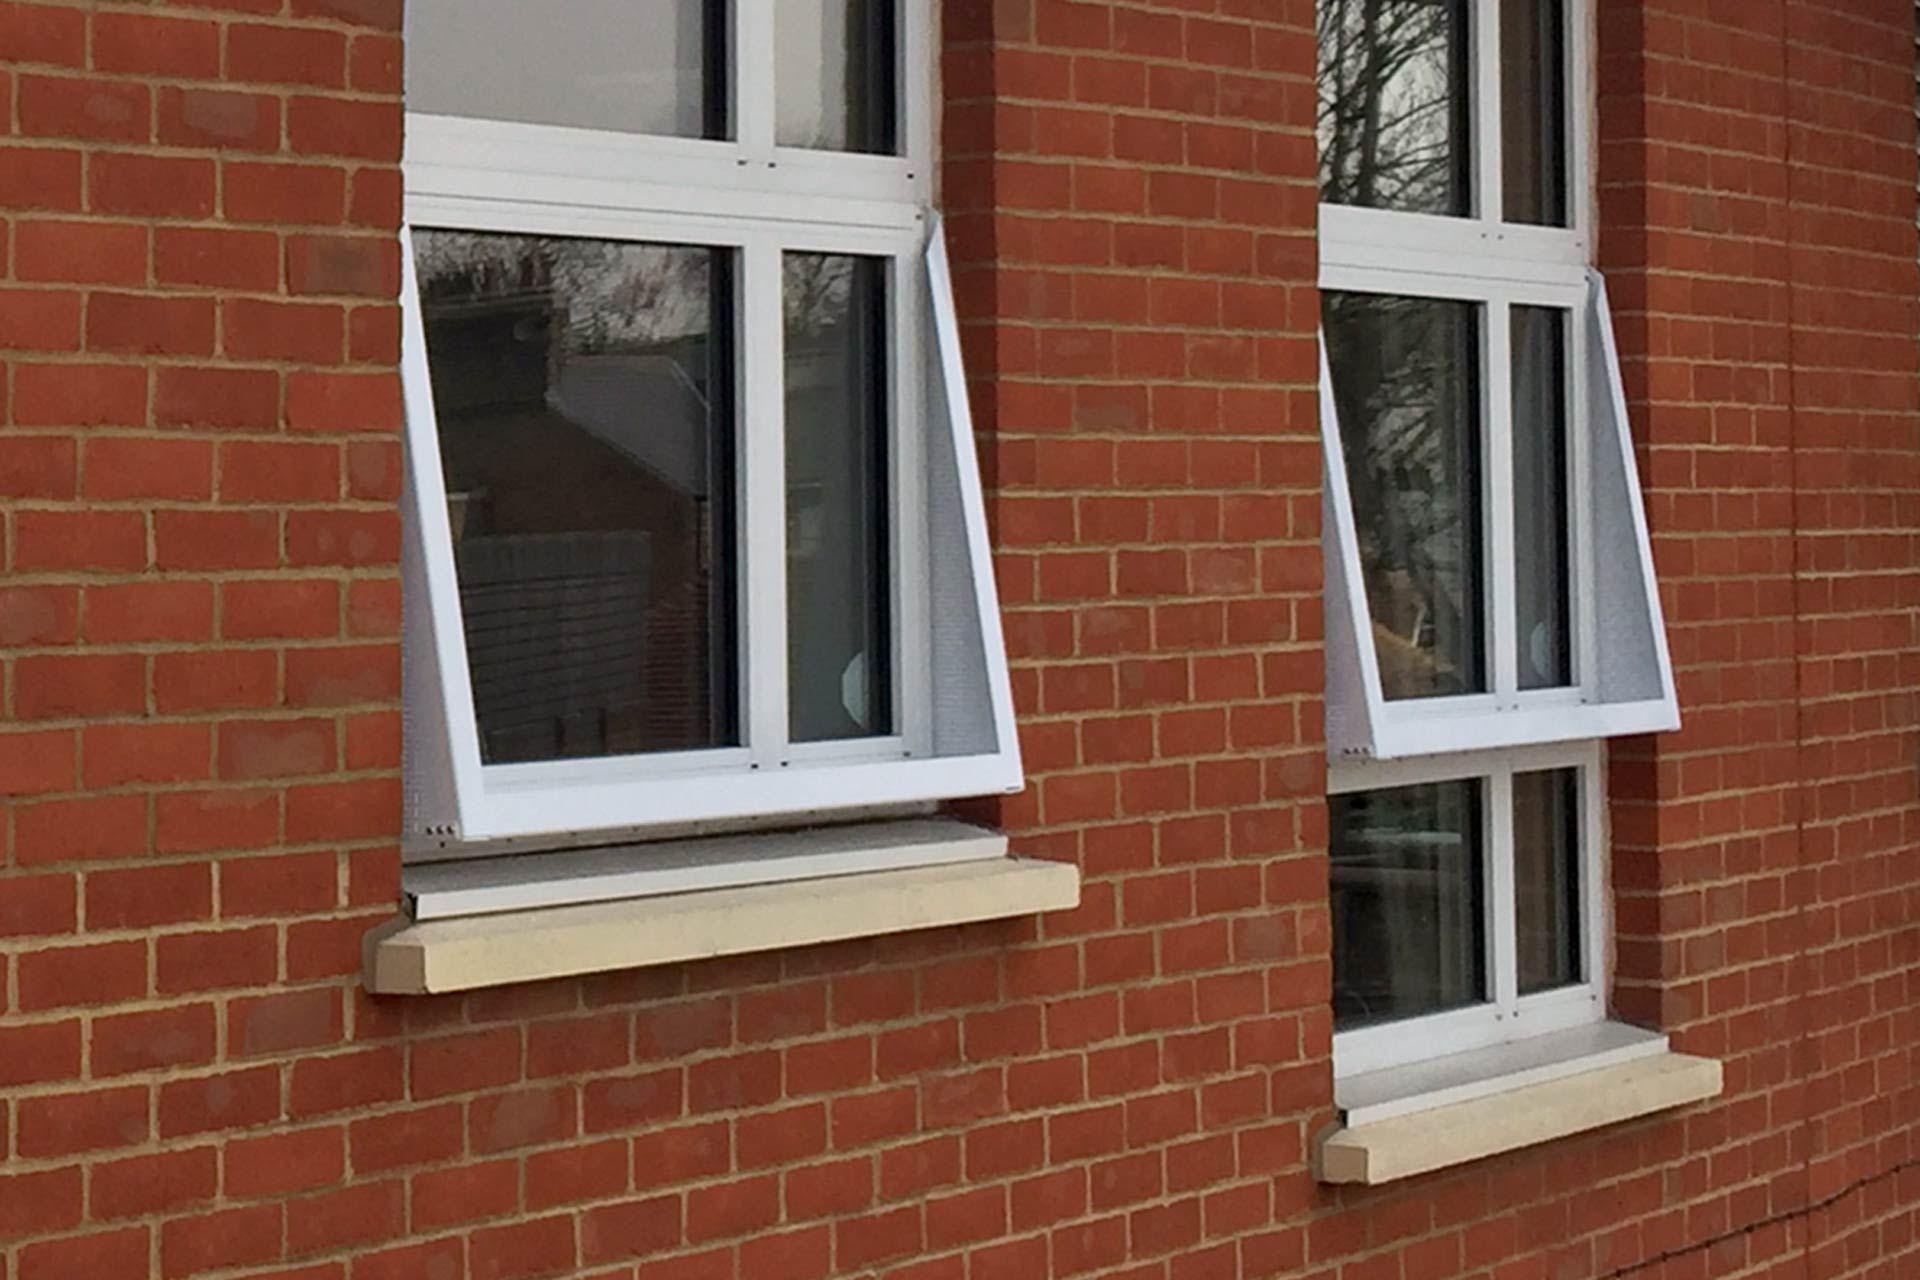 3-part window restrictors